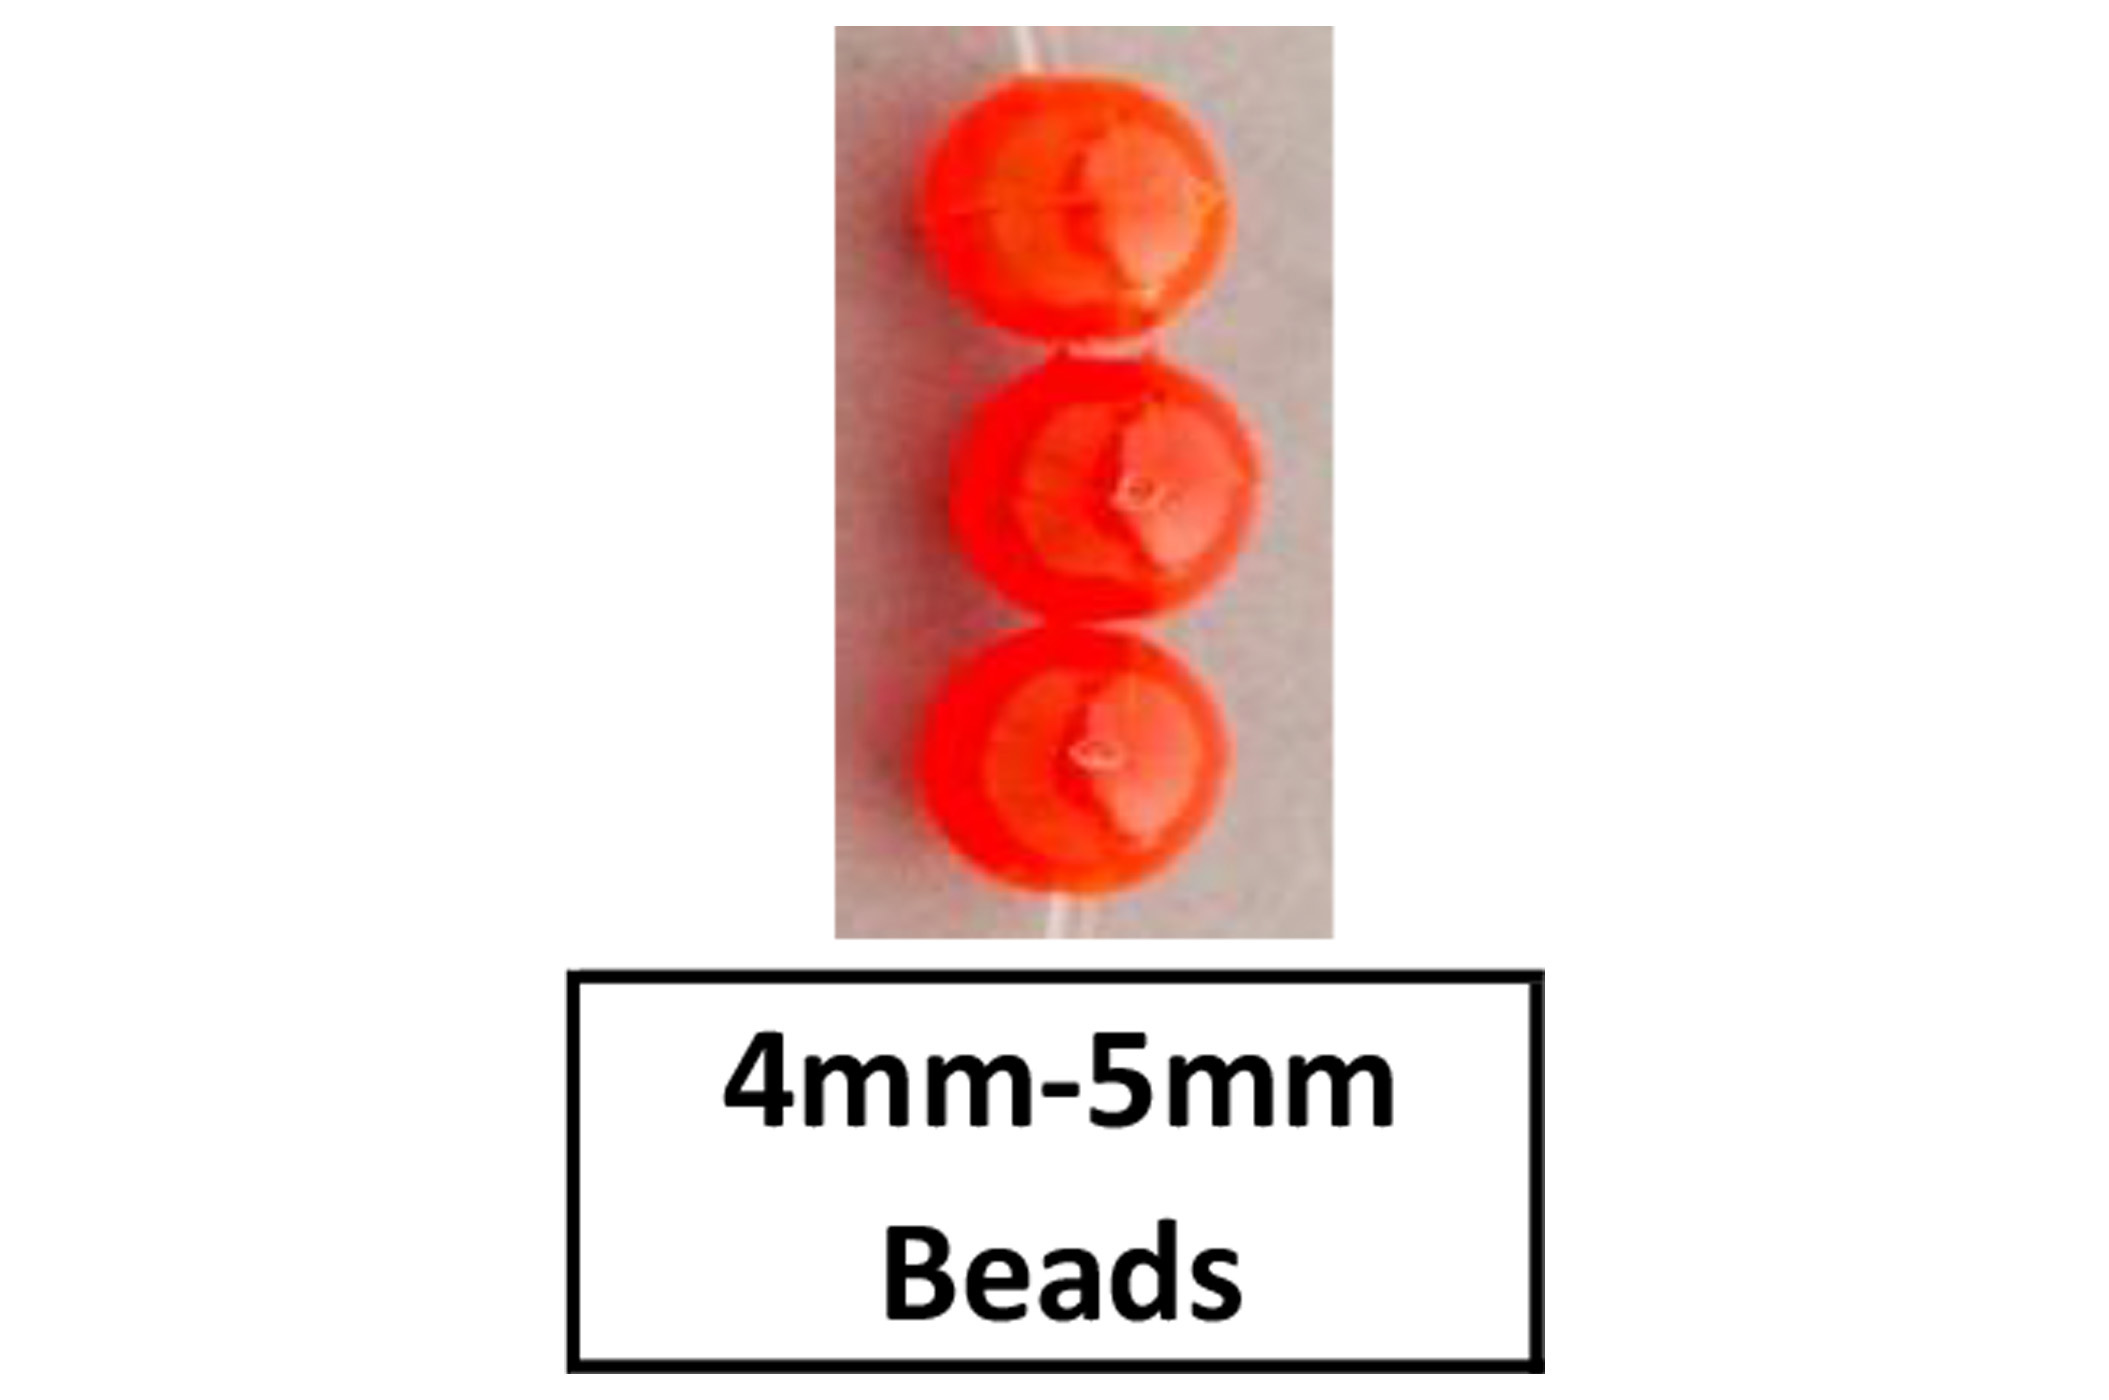 4-5mm bead